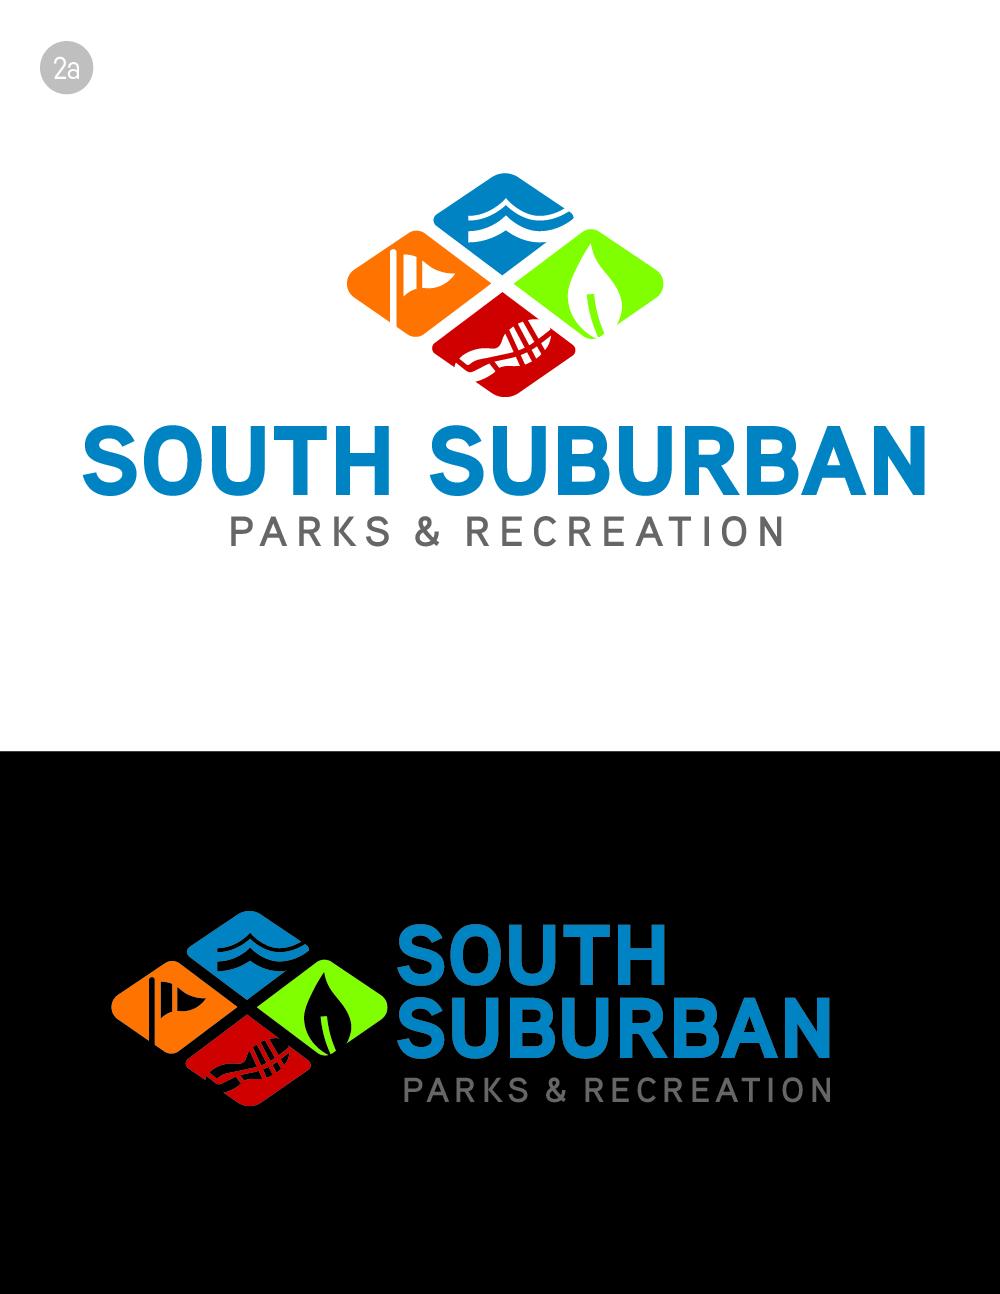 2018-05-03 SS logo 2a.jpg